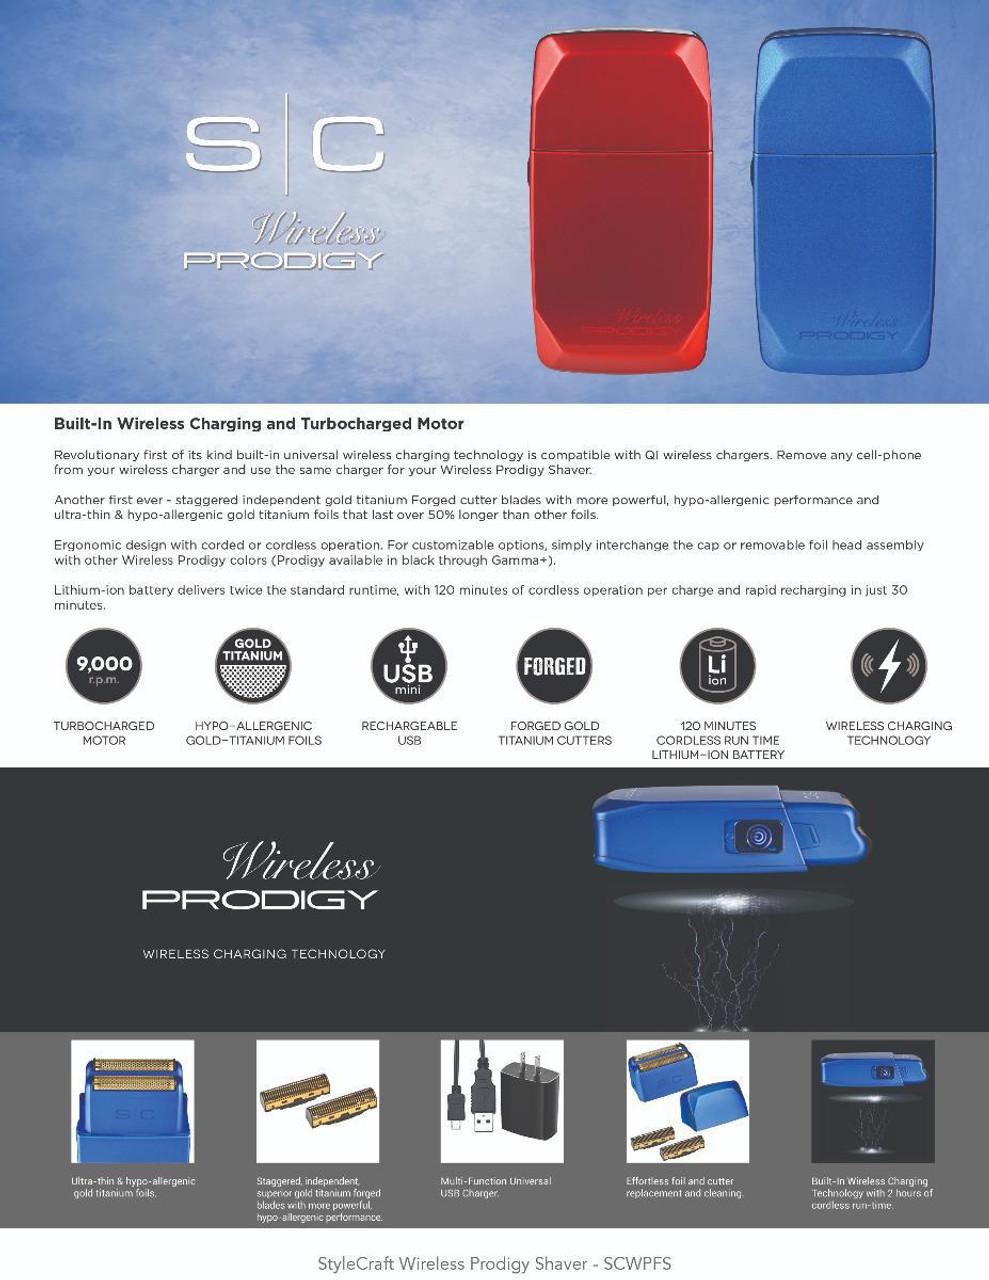 Stylecraft Prodigy Wireless Foil Shaver - Shiny Metallic Red